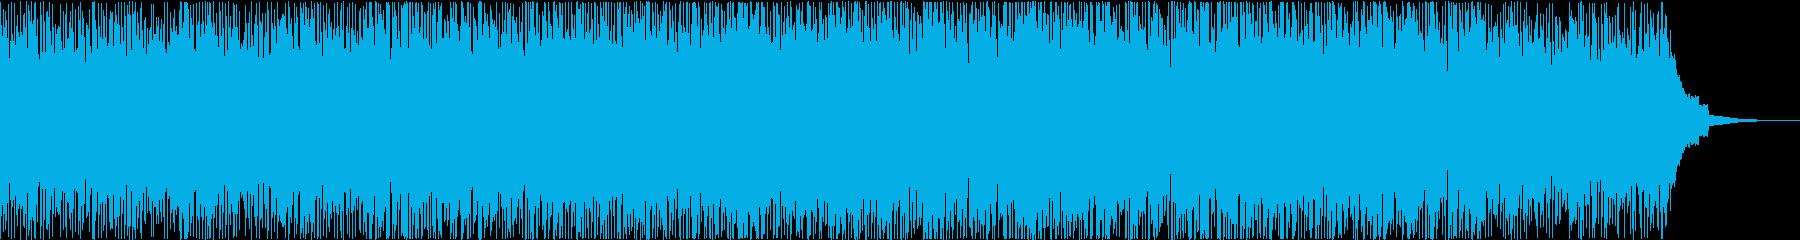 Happy Weekend's reproduced waveform